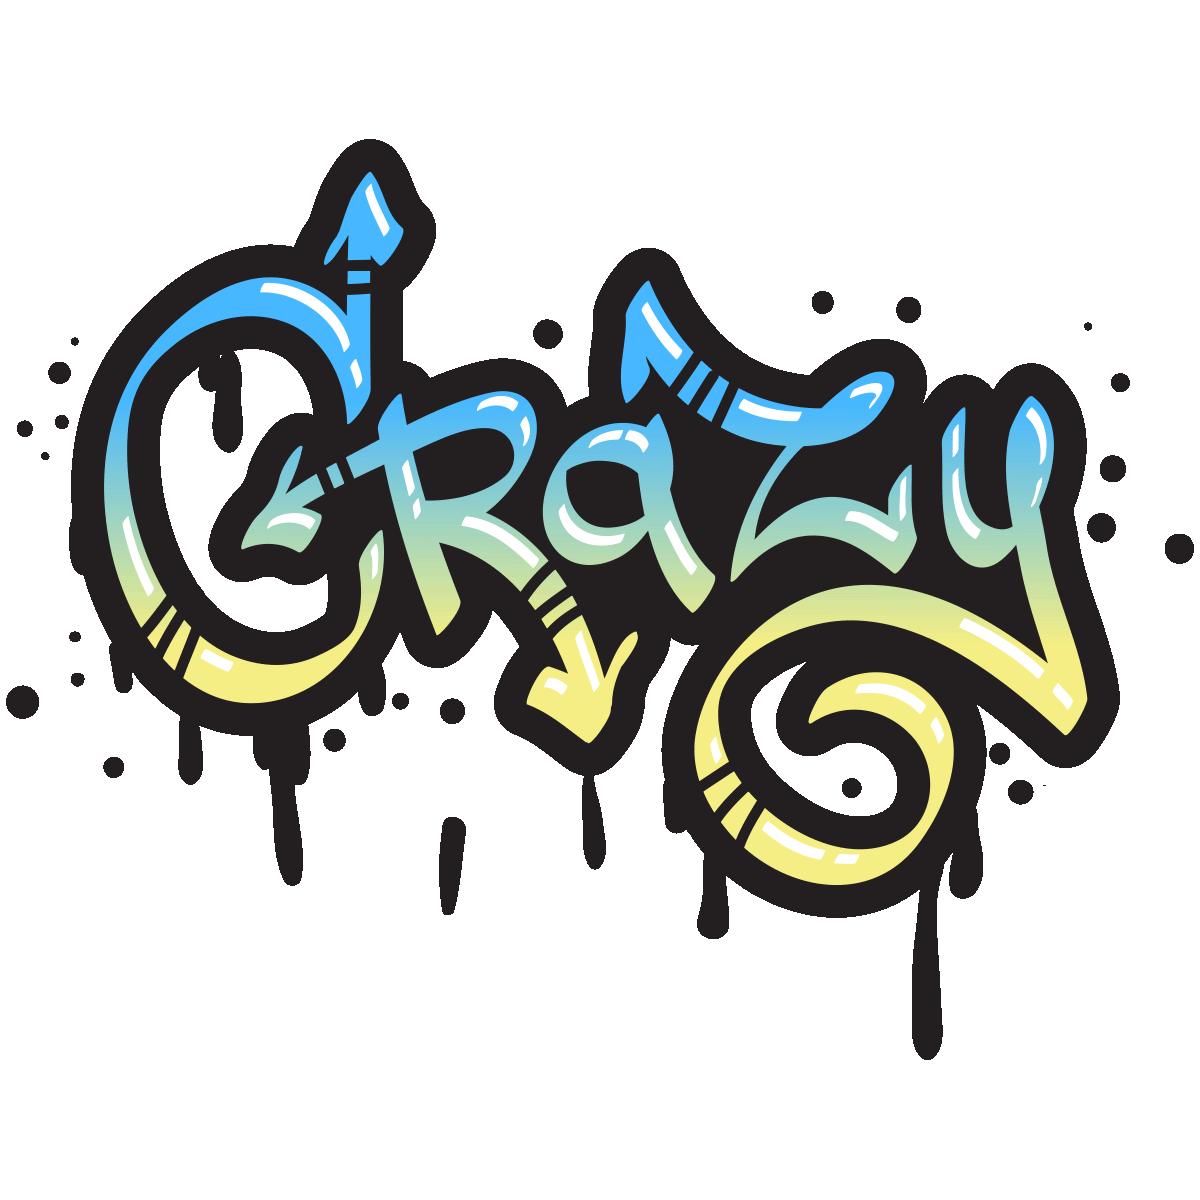 sticker graffiti crazy � stickers art et design graffitis